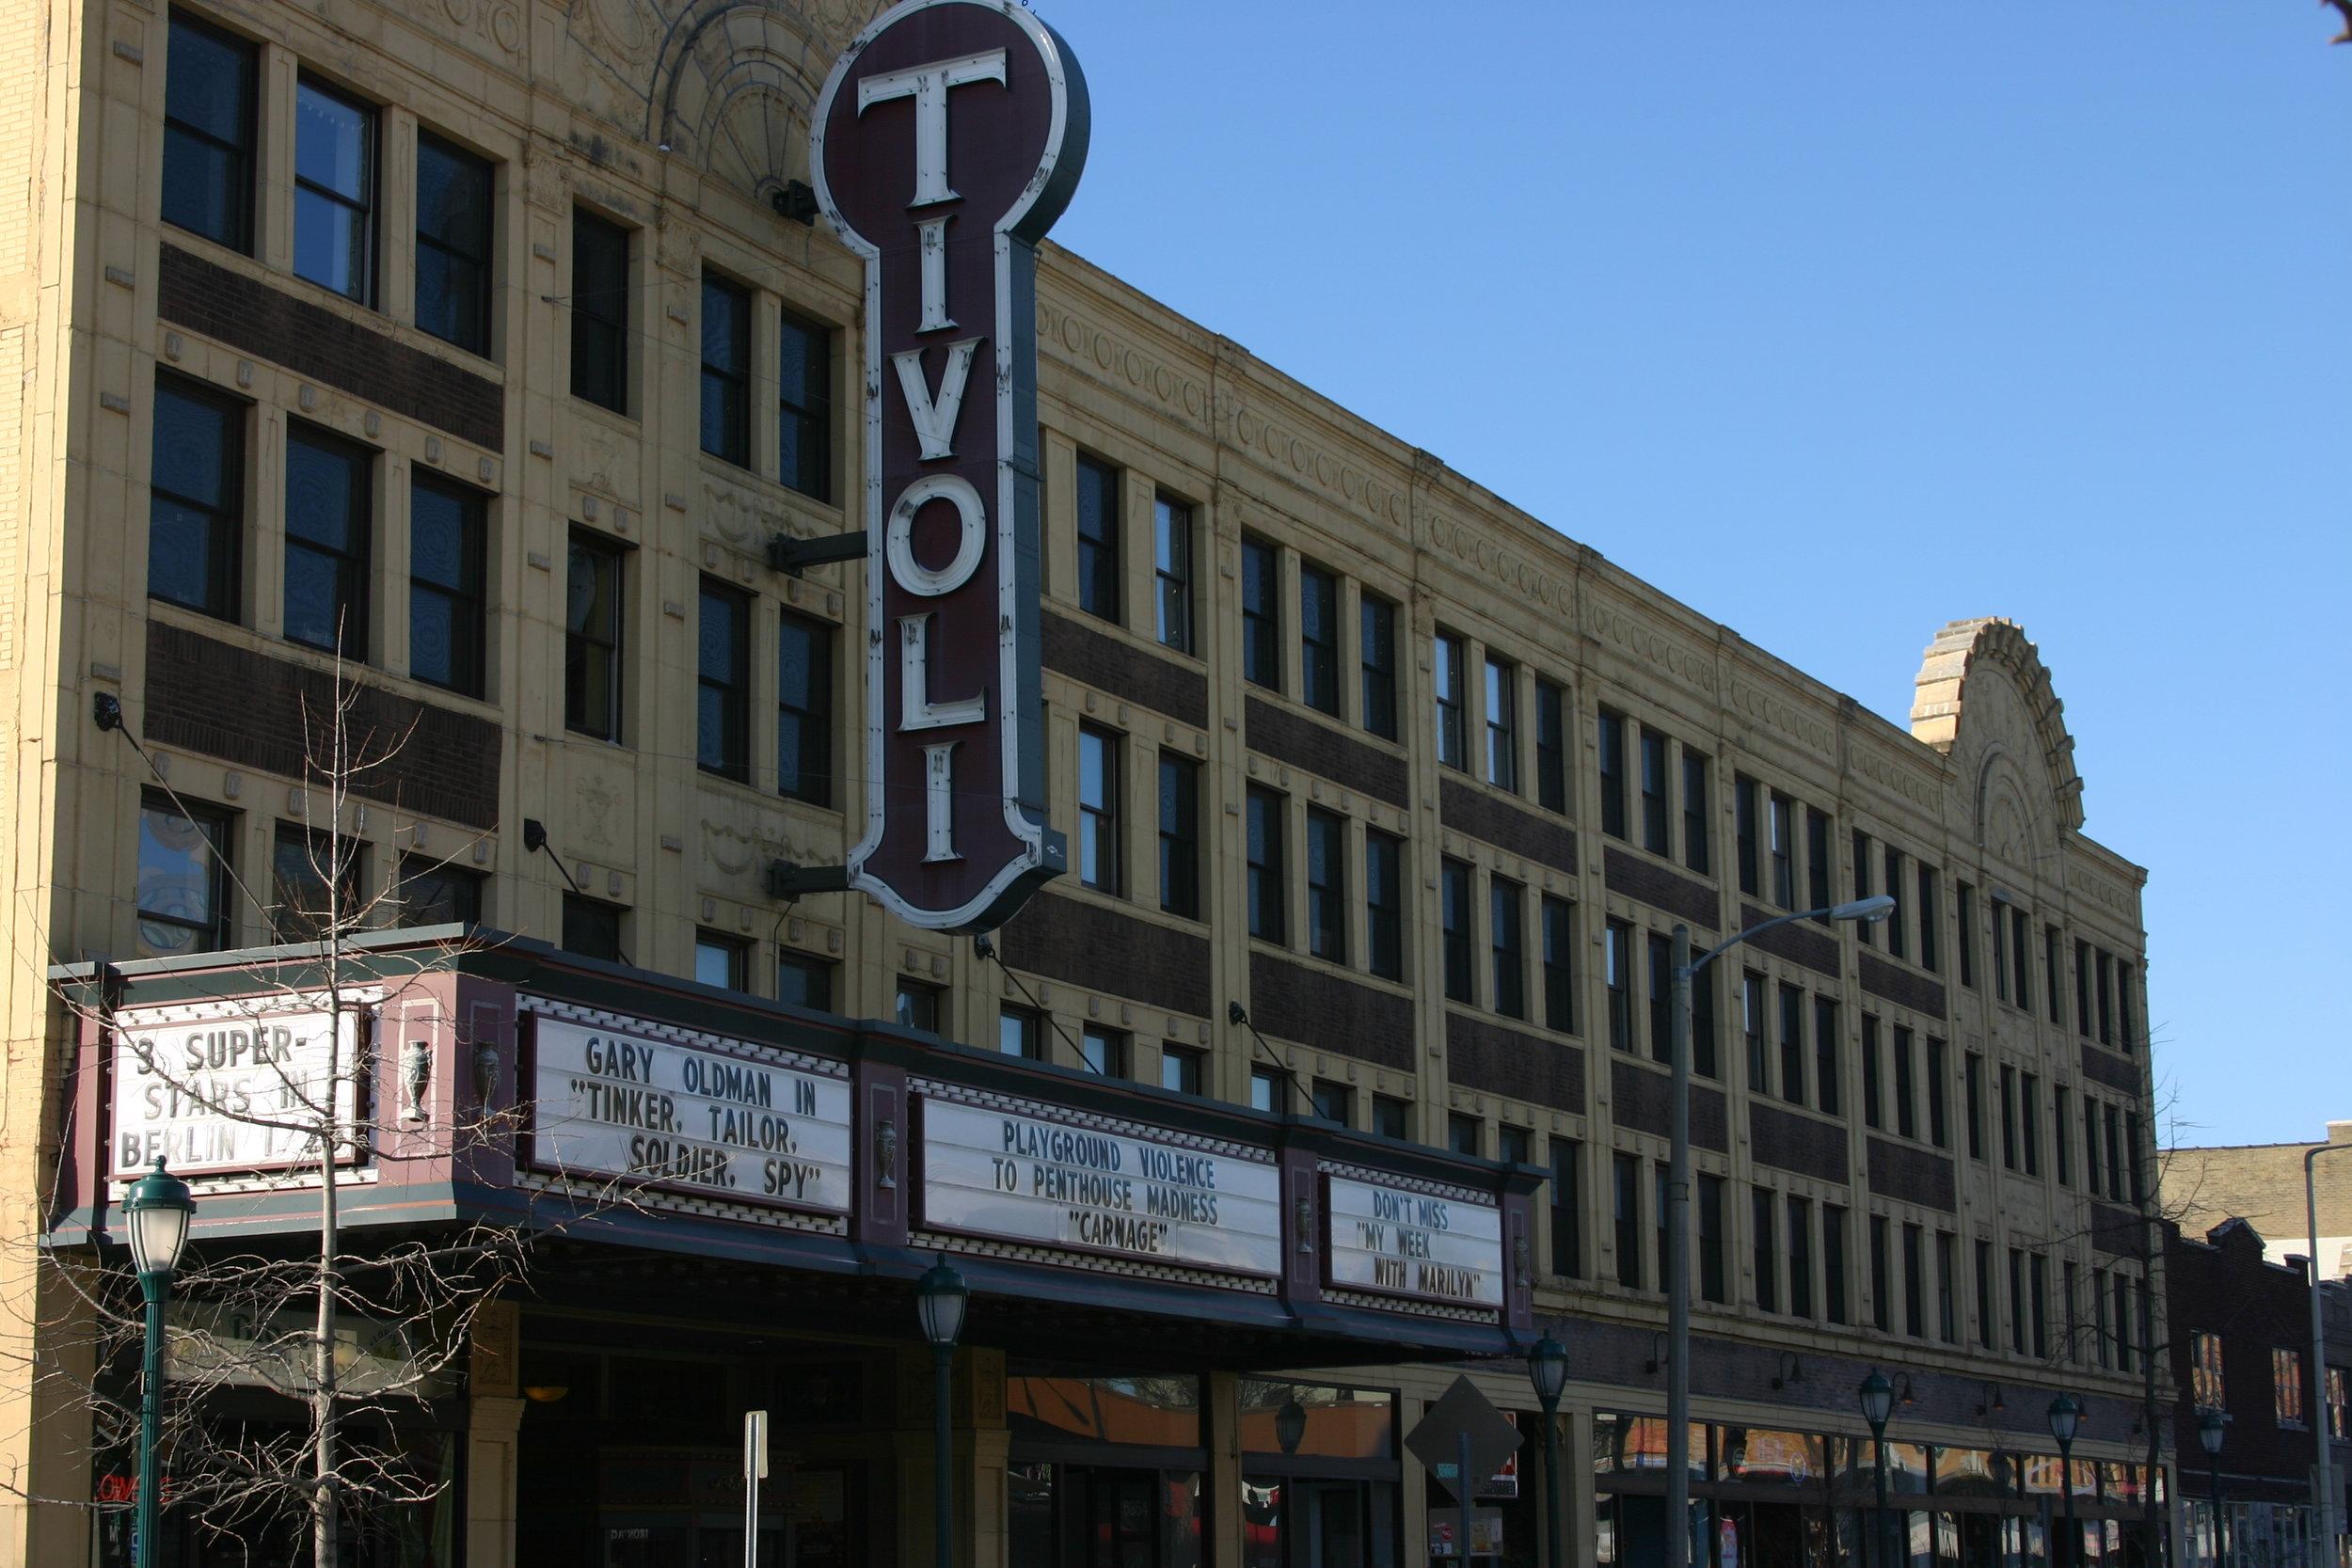 Tivoli Theater, Delmar Loop, St. Louis, January 2012